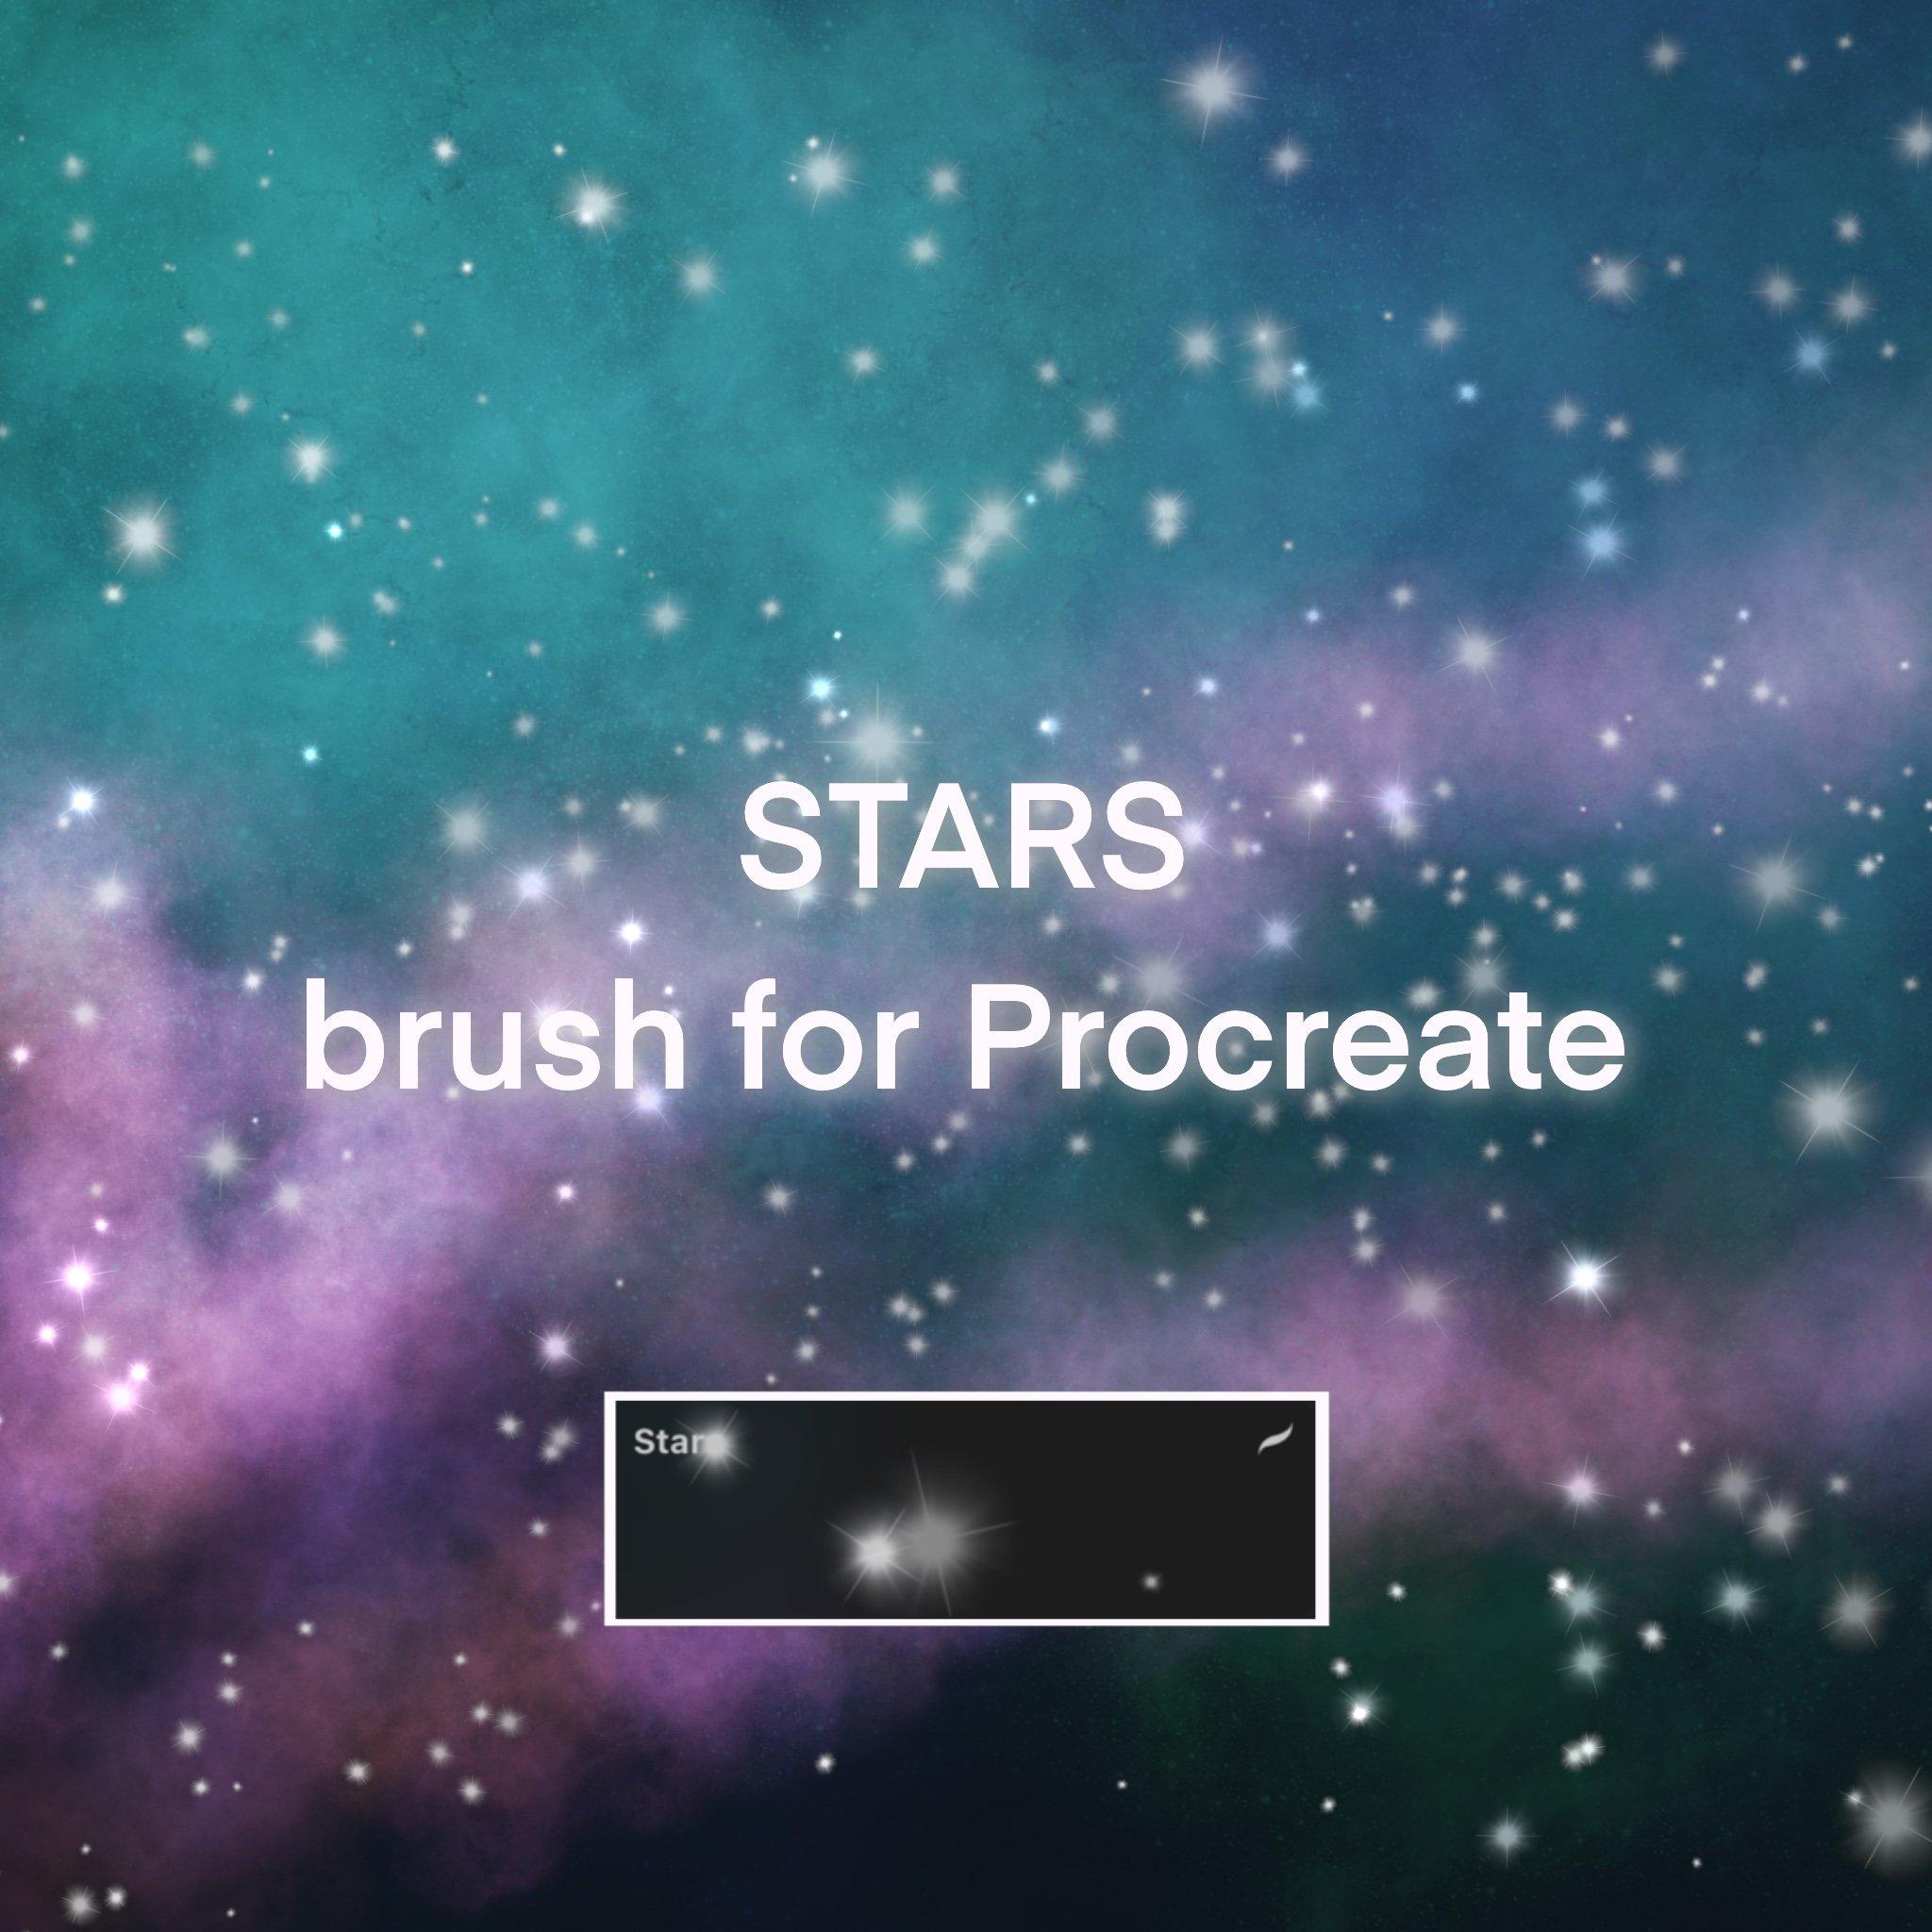 Stars brush for Procreate